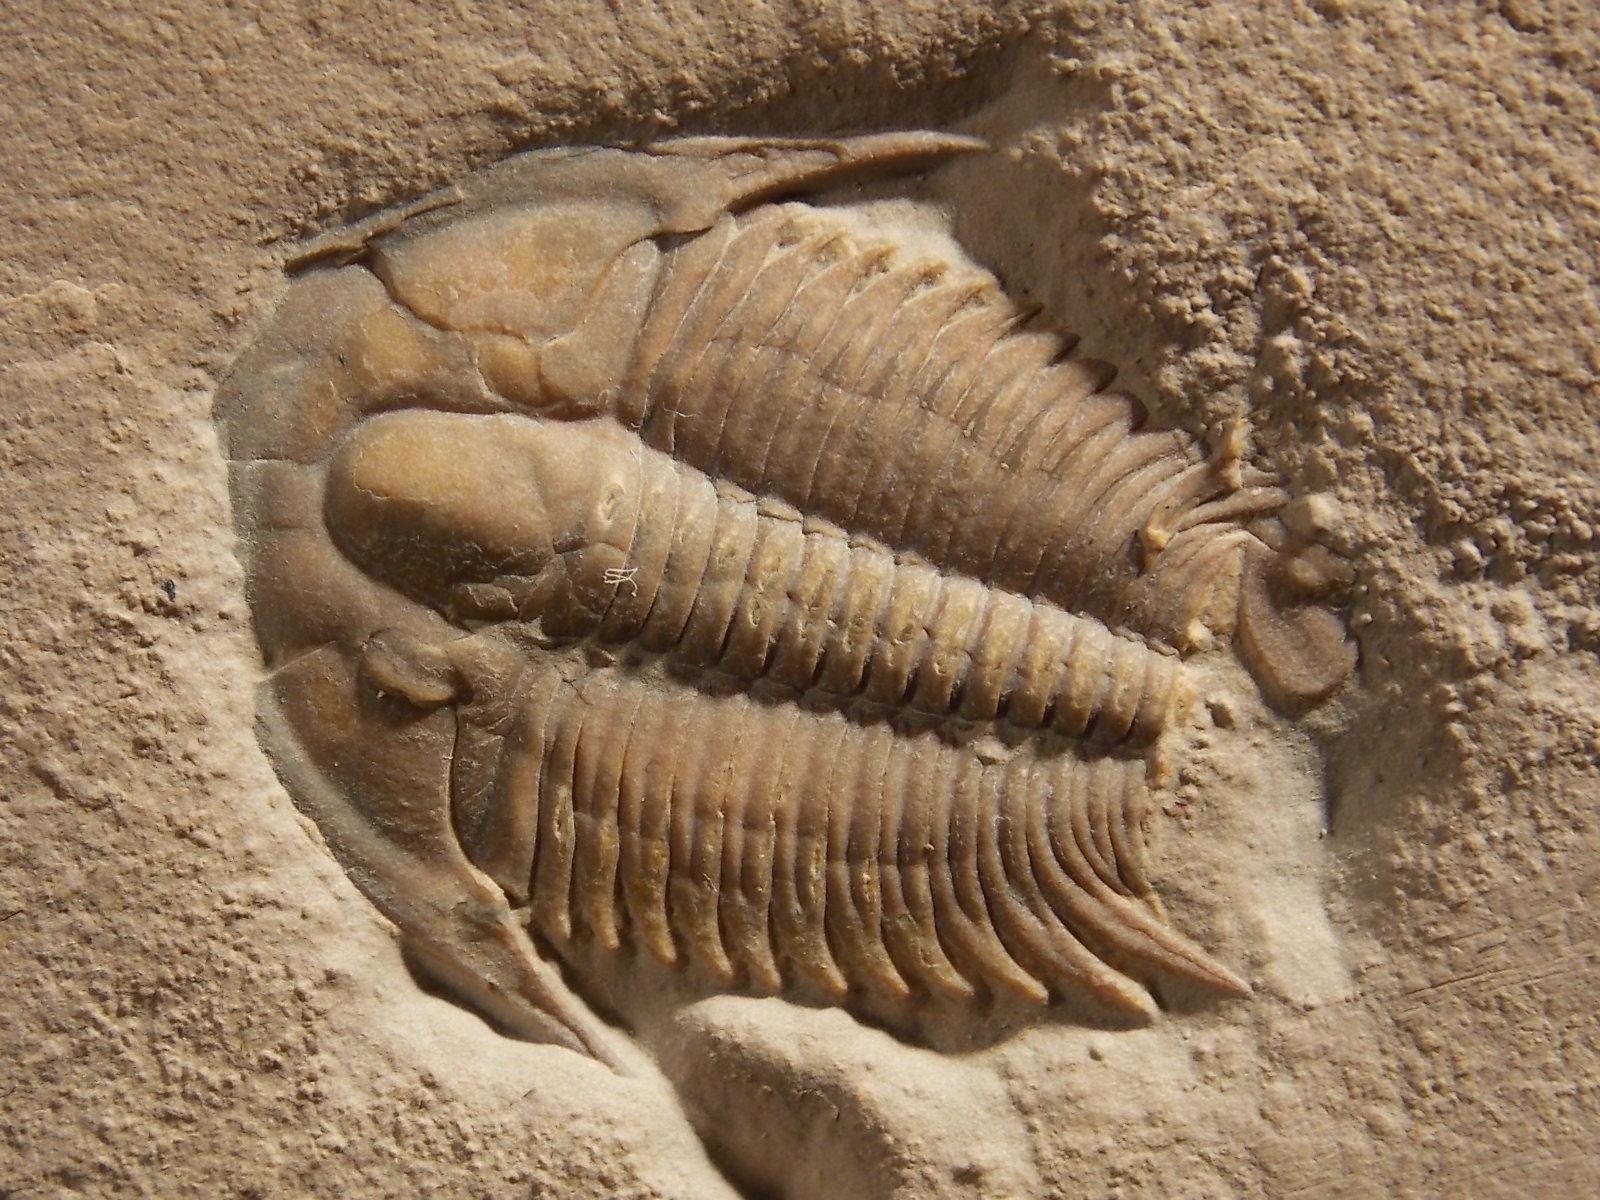 Lars krutak tatu lu tattoos from the dreamtime lars krutak -  9 Trilobite Fossil Modocia Typicalis Marjum Shale From Utah